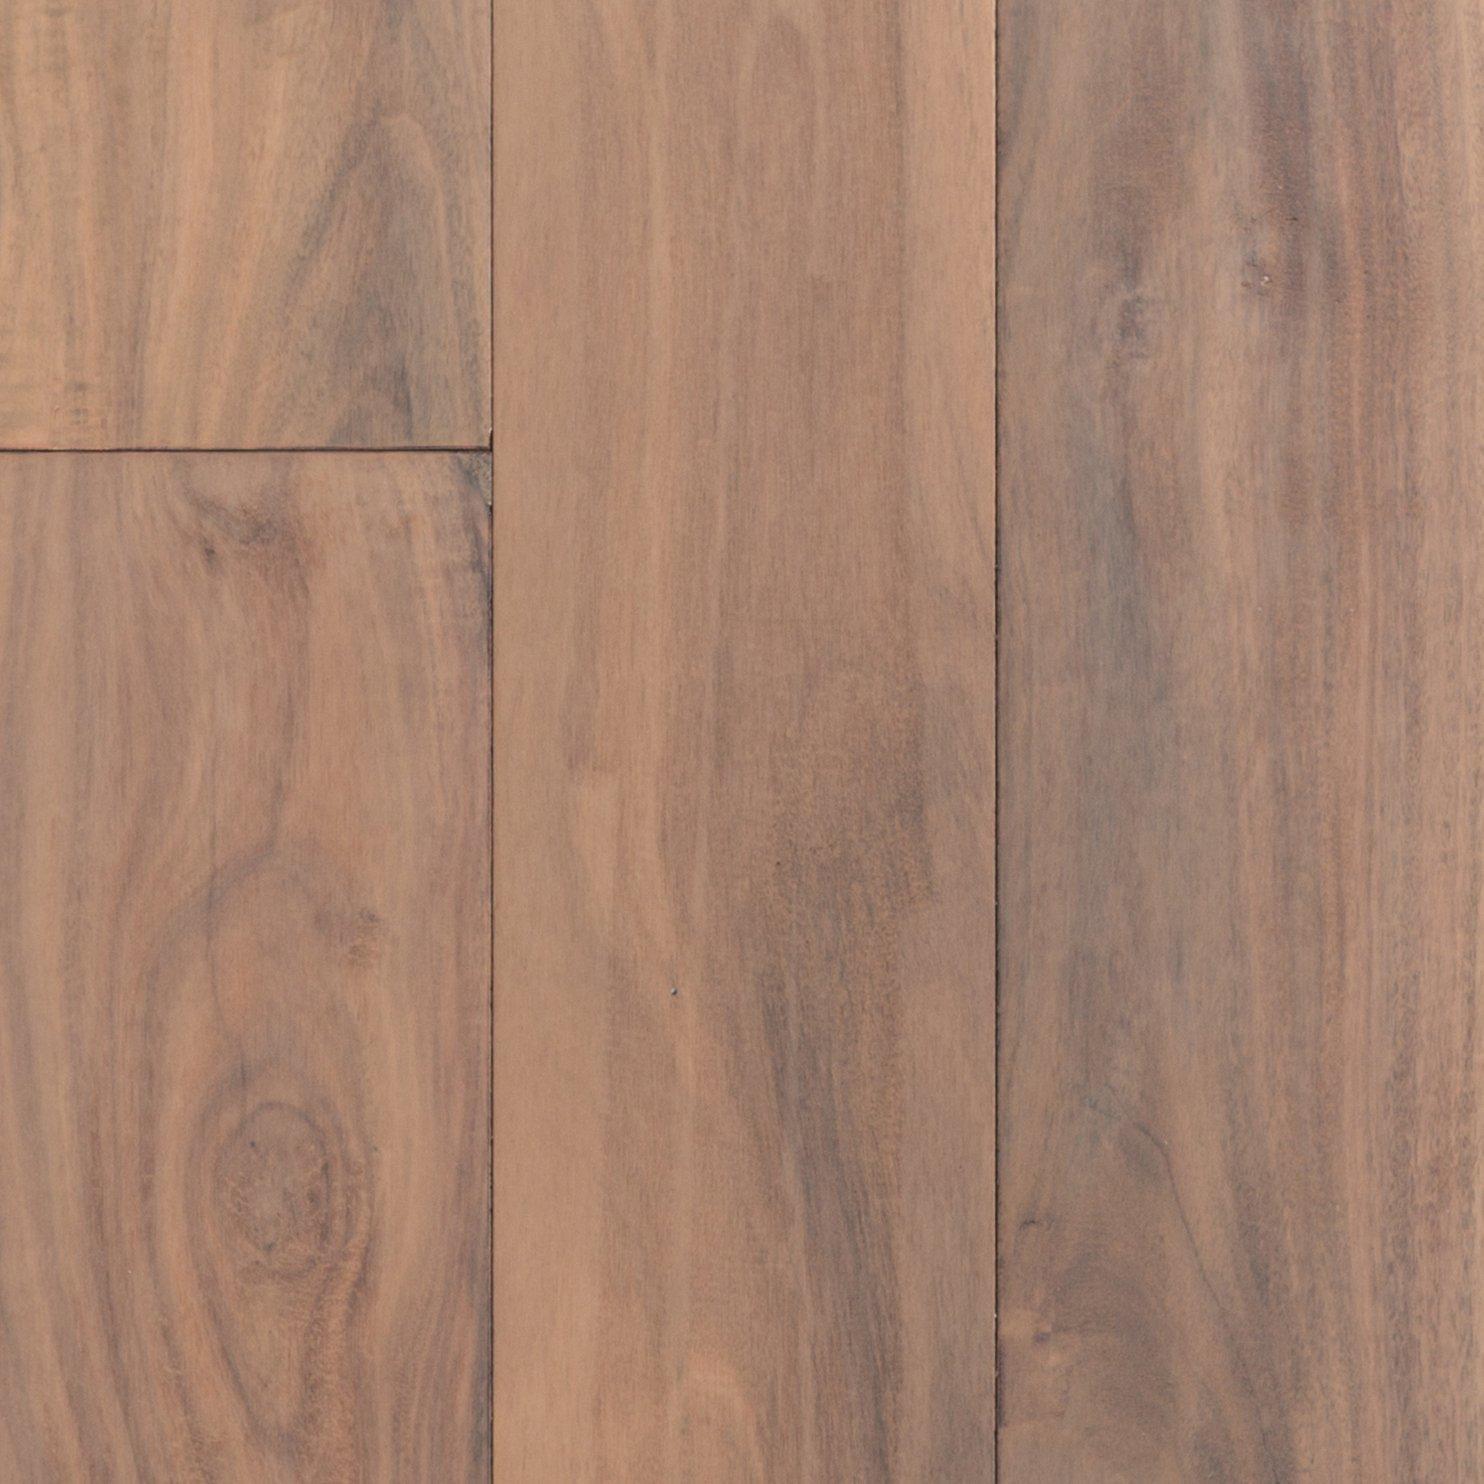 bahiti acacia hand scraped engineered hardwood 12in x 5in floor and decor